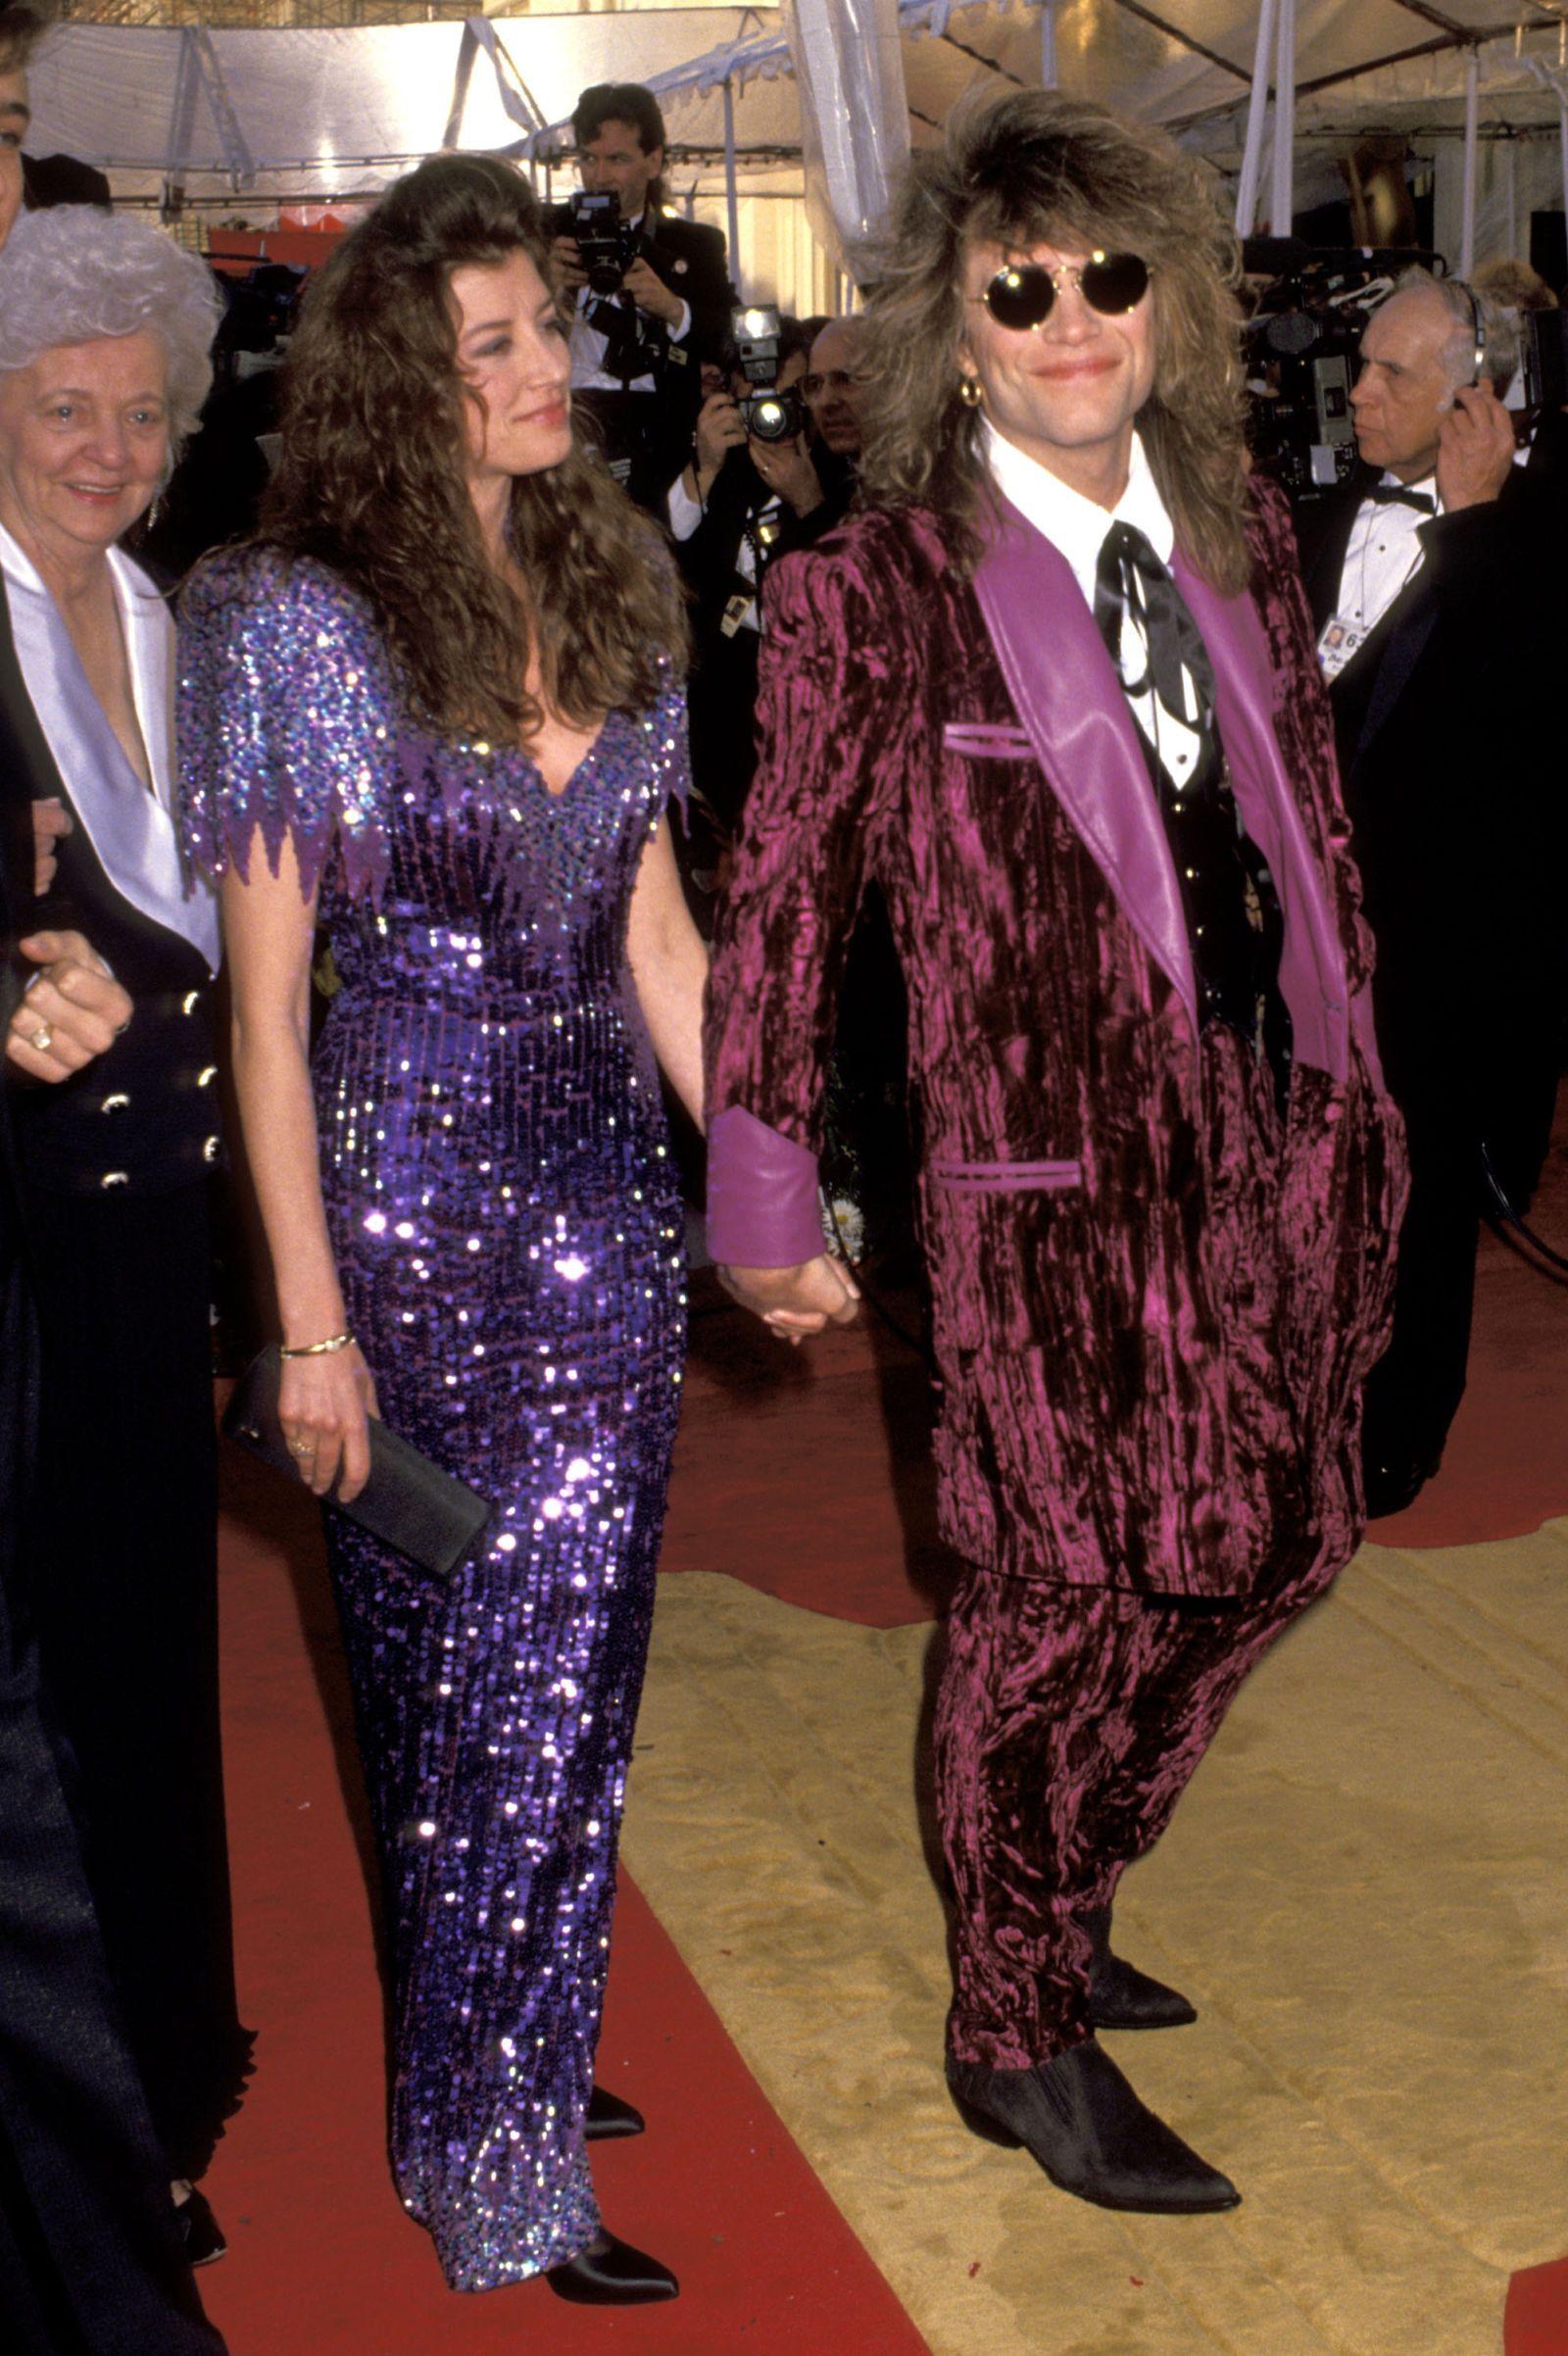 The 35 Worst Fashion Fails in Oscars History The 35 Worst Fashion Fails in Oscars History new pictures